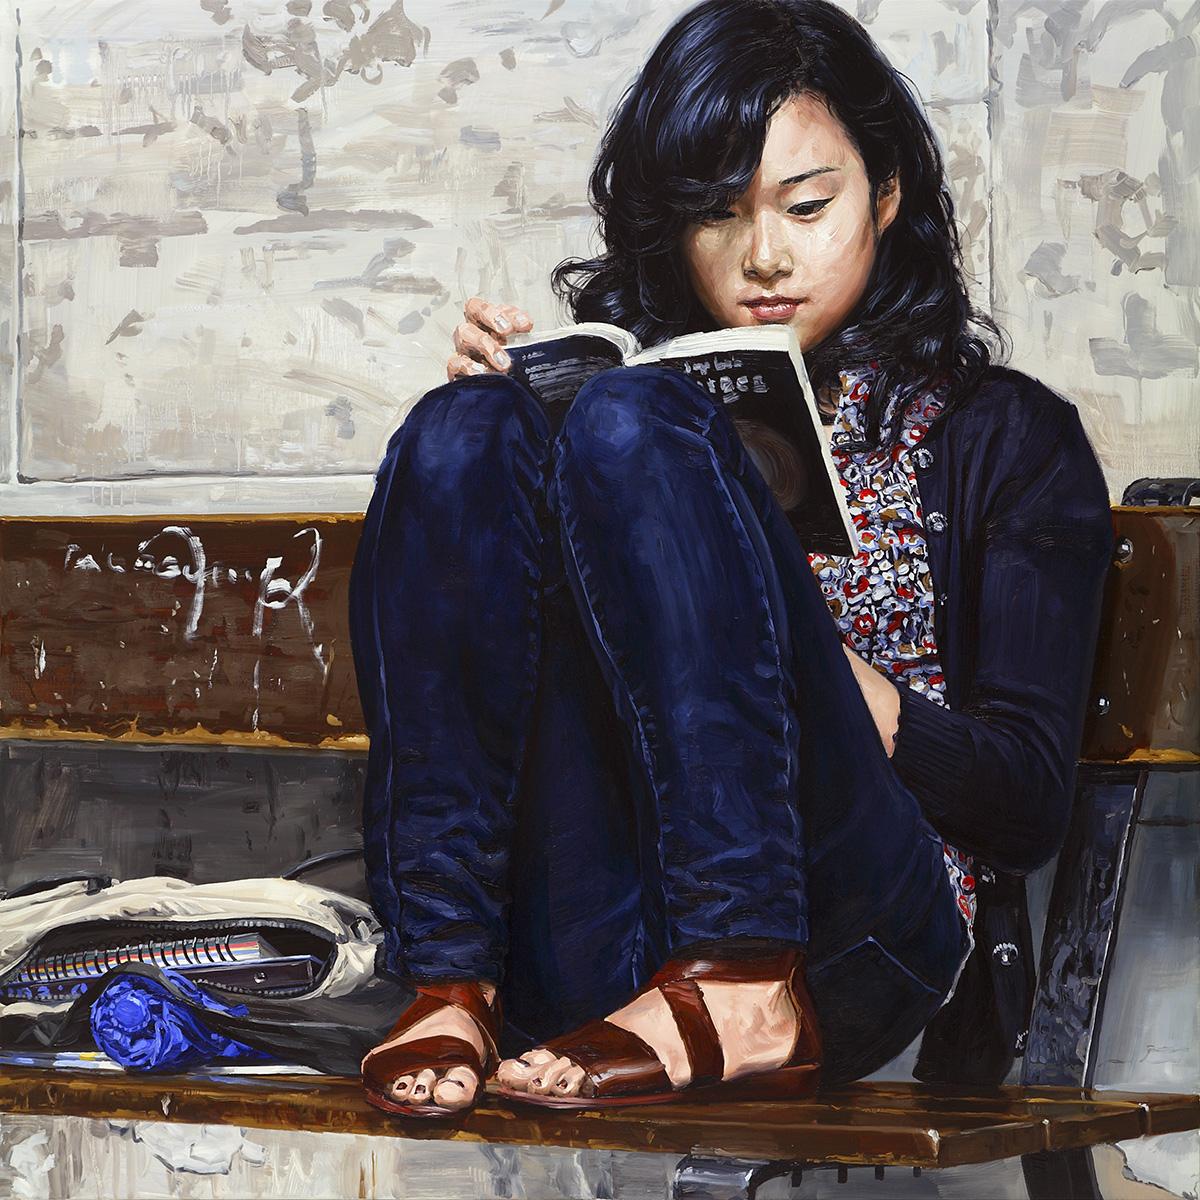 chinese-girl-reading-bench-140x140cm.jpg